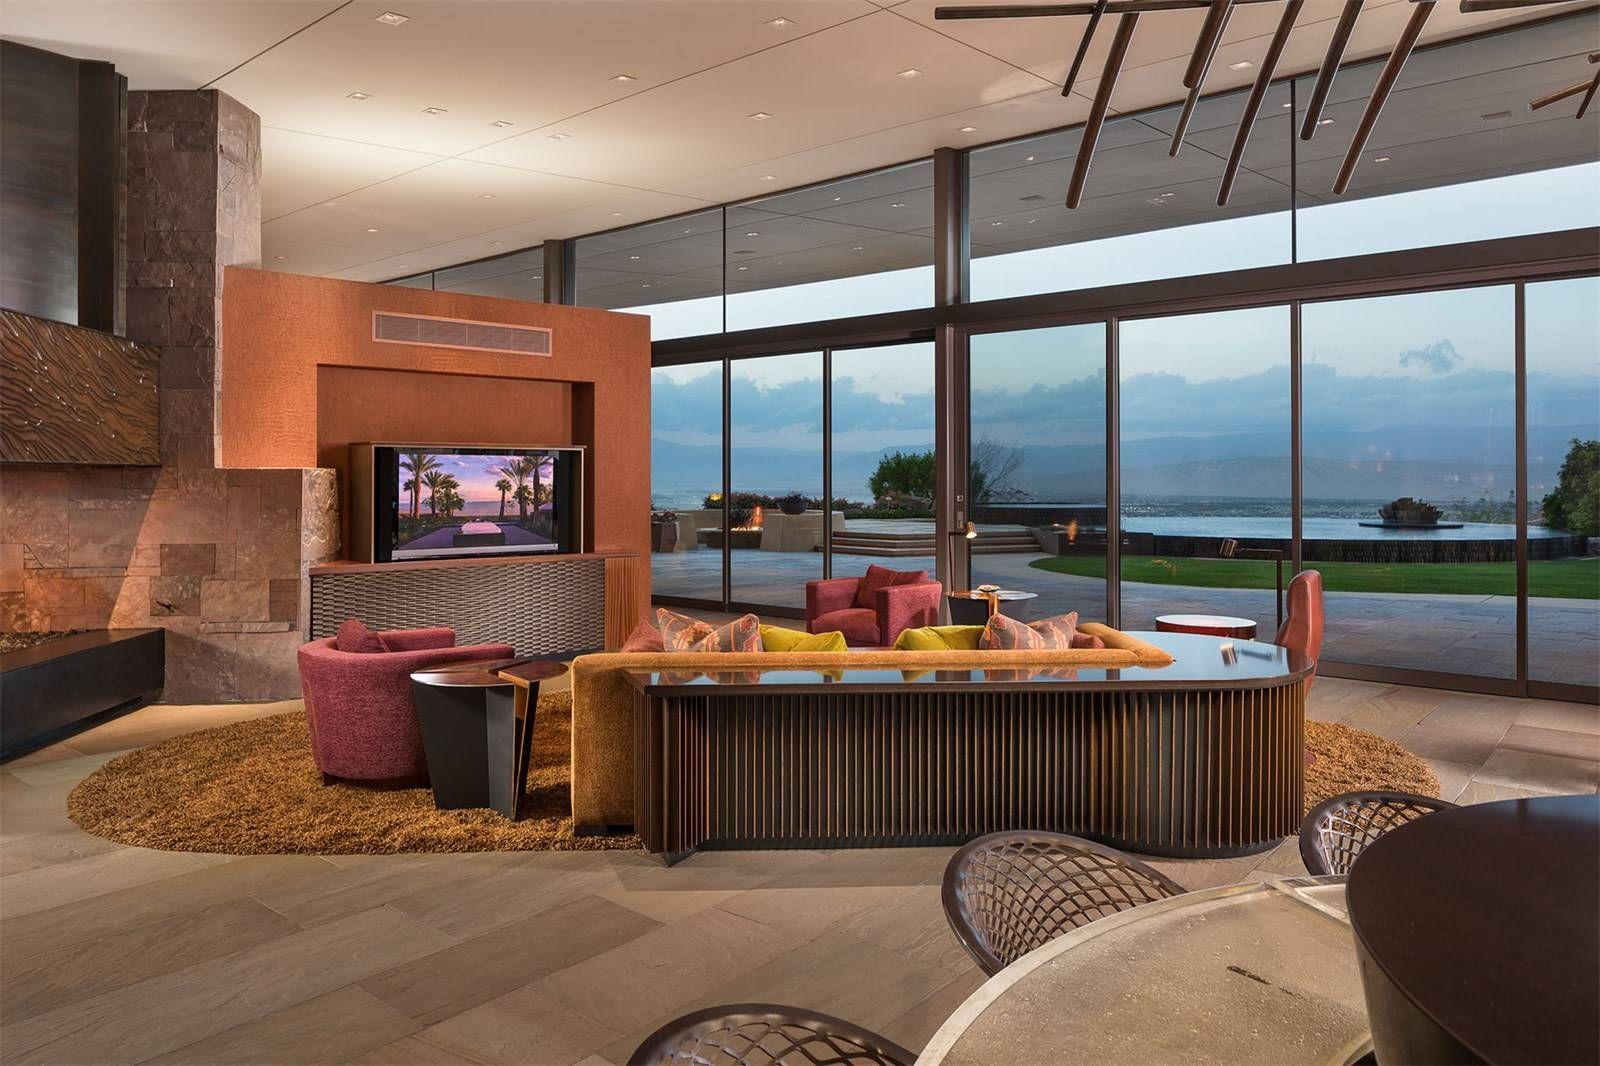 38 Sky Ridge Rancho Mirage, California, United States